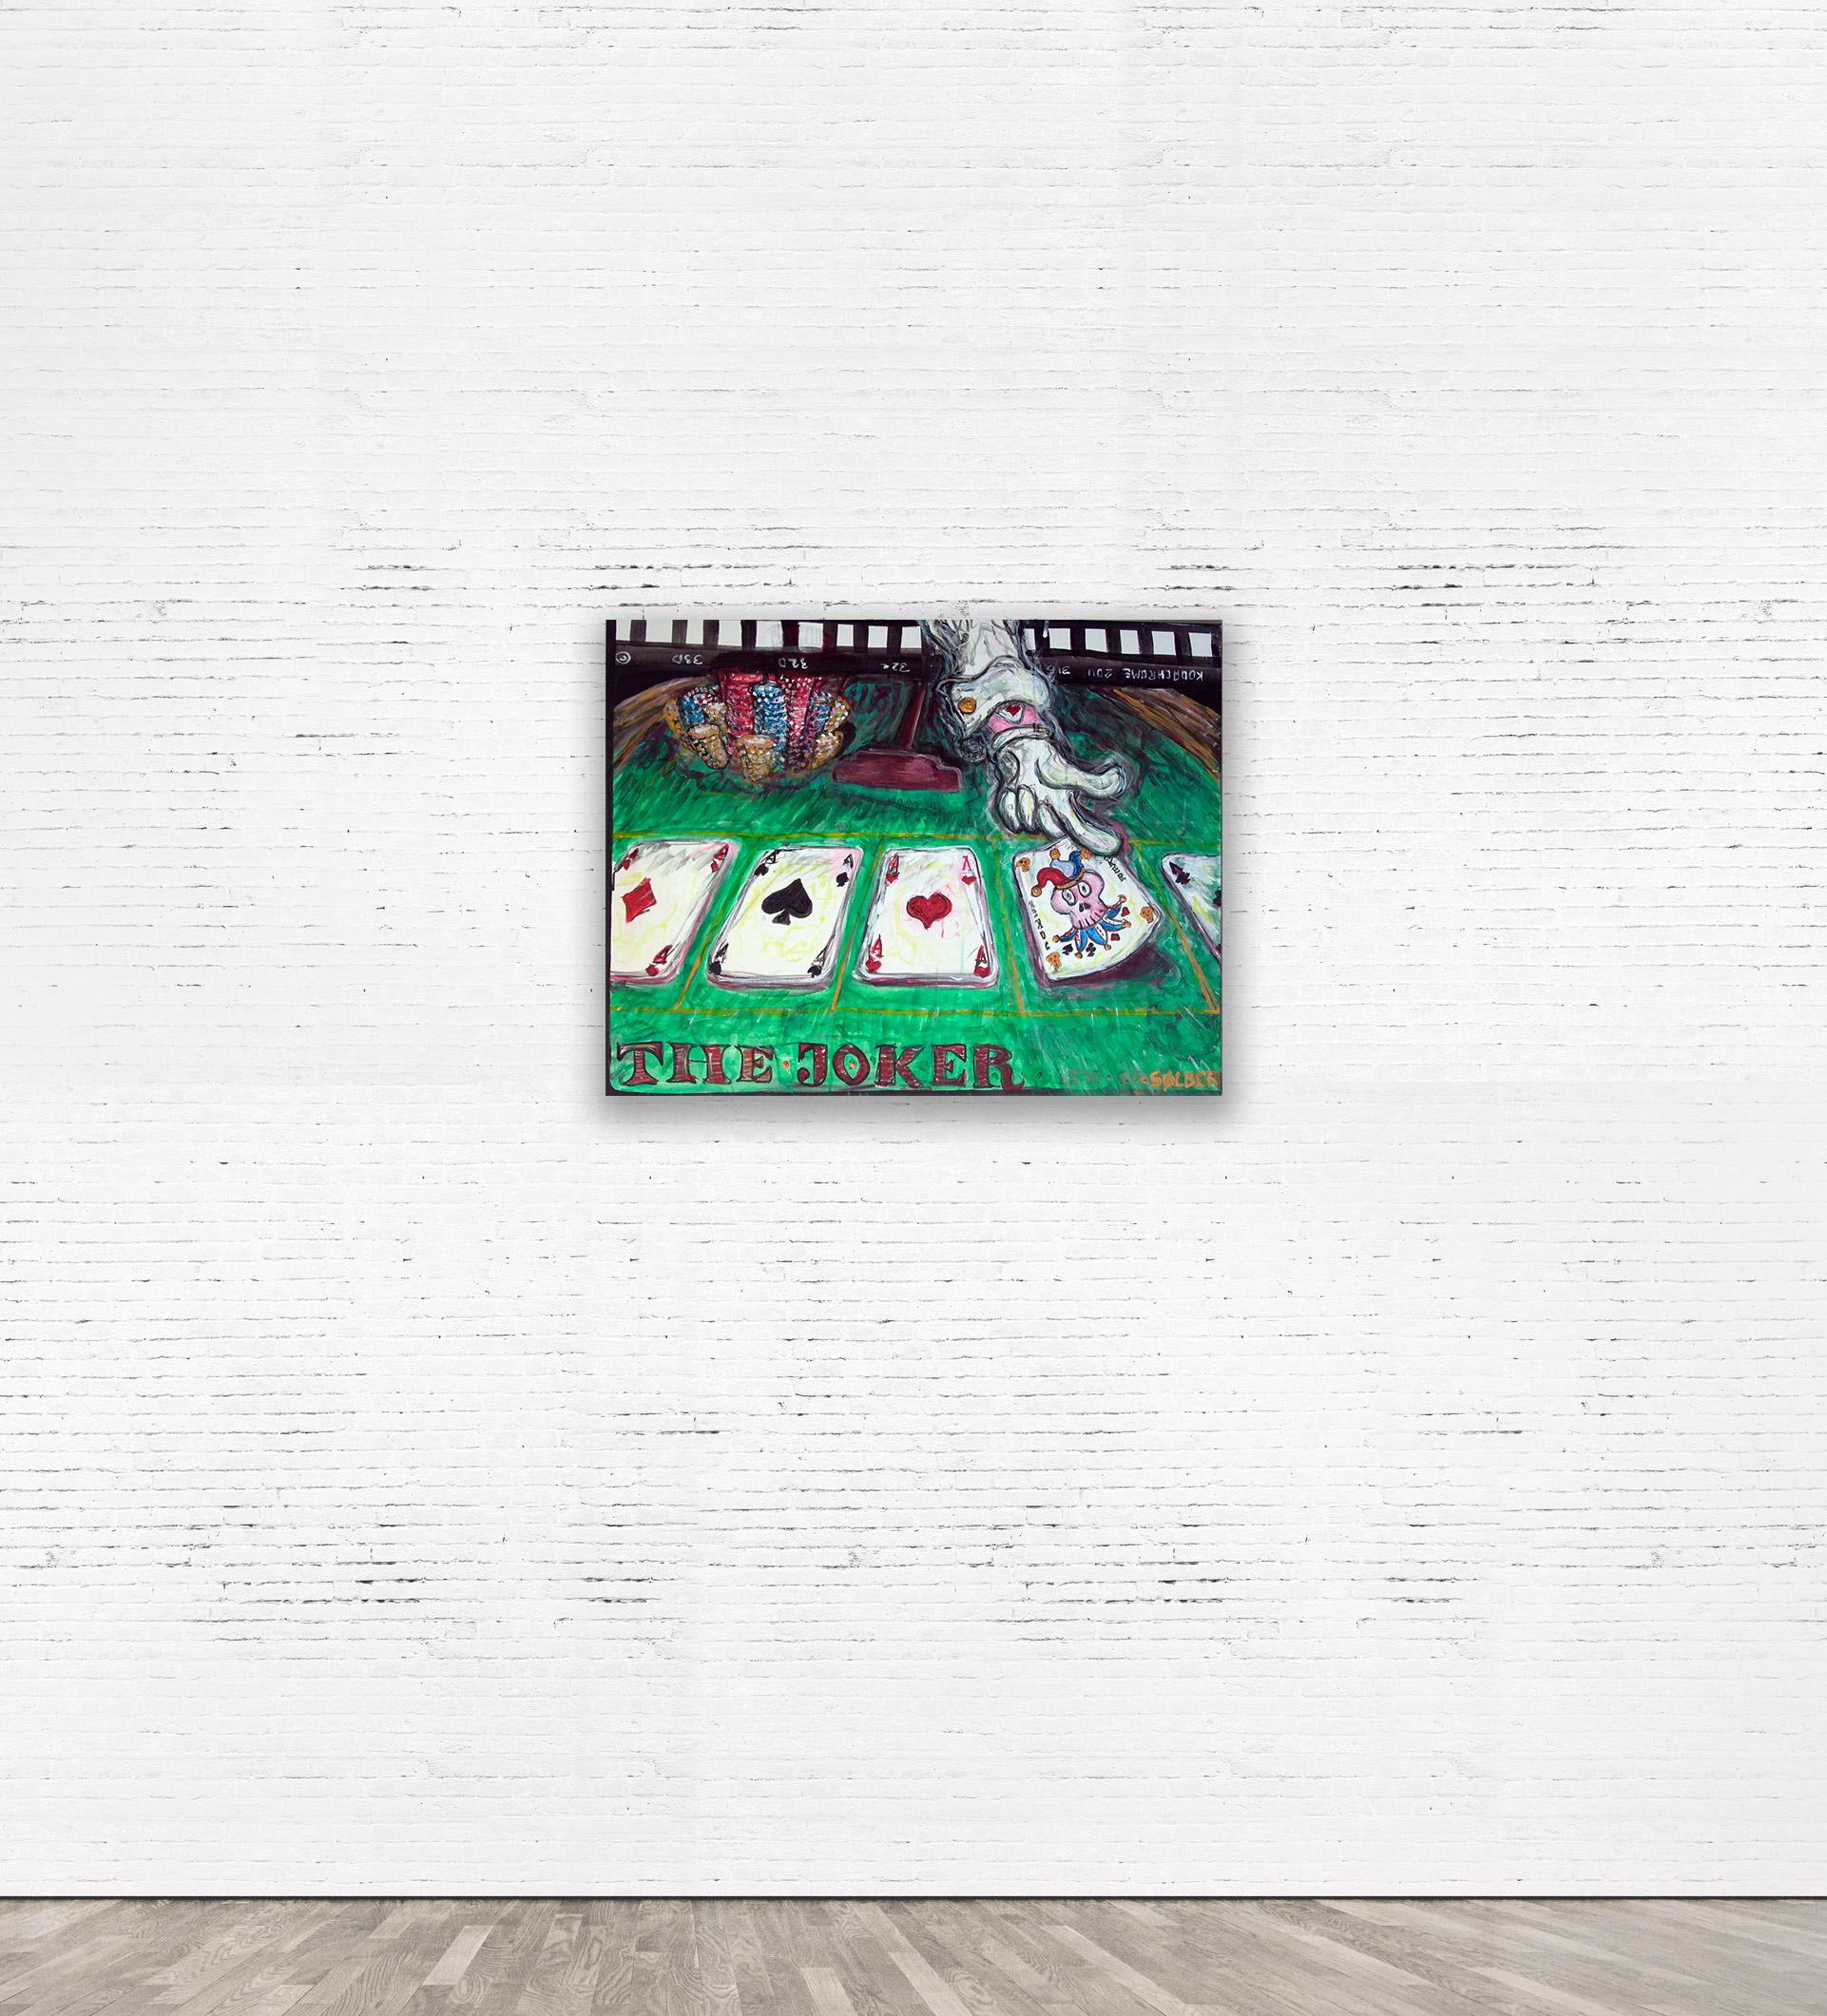 """The Joker""  2013 80 x 60 cm Acrylic on canvas.   SOLD."